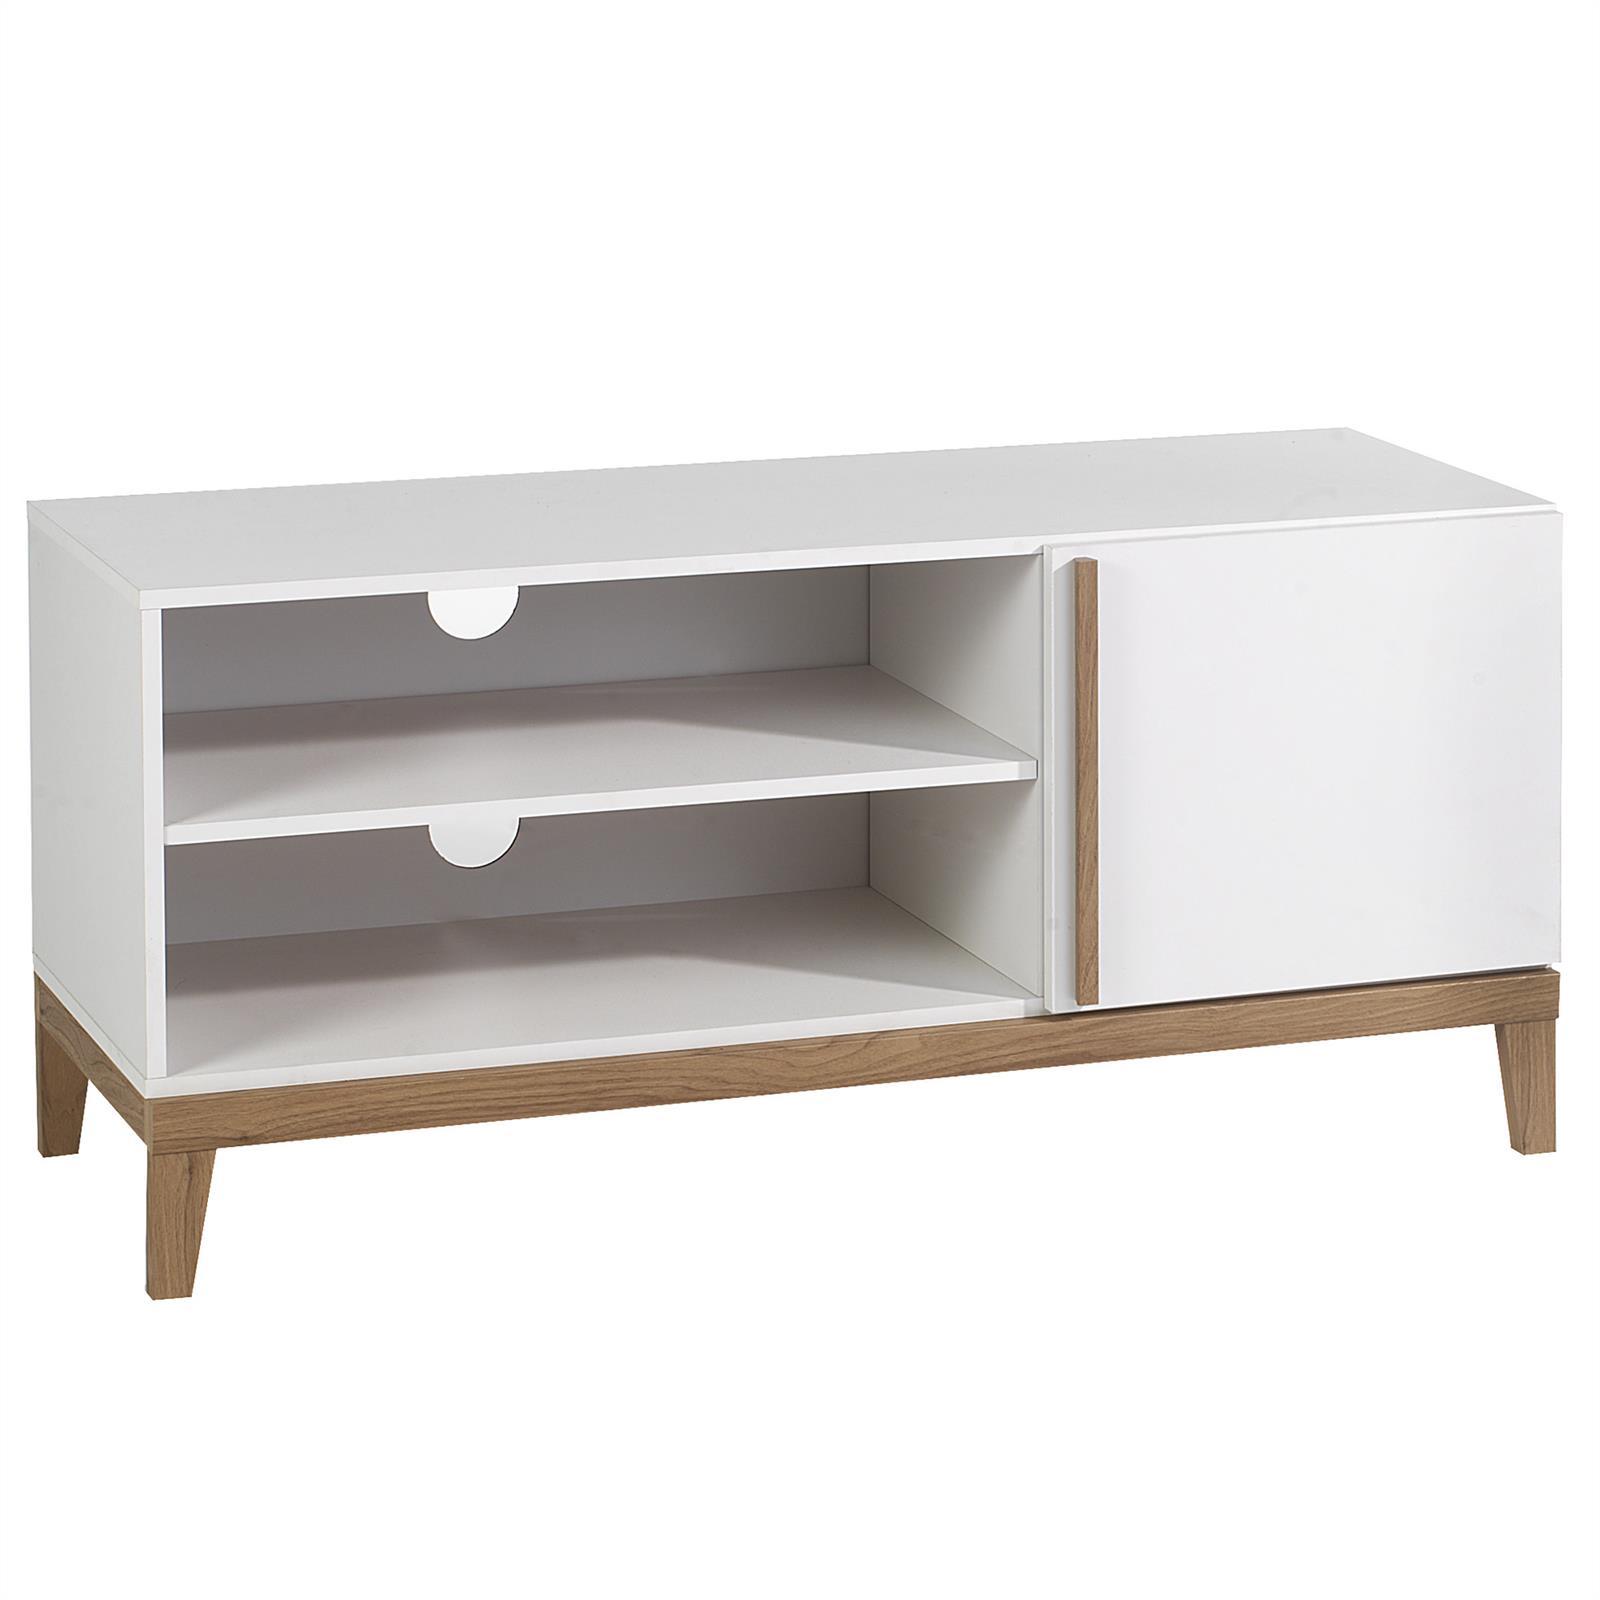 Meuble tv riga 2 niches 1 porte blanc et bois mobil for Meuble bois et blanc